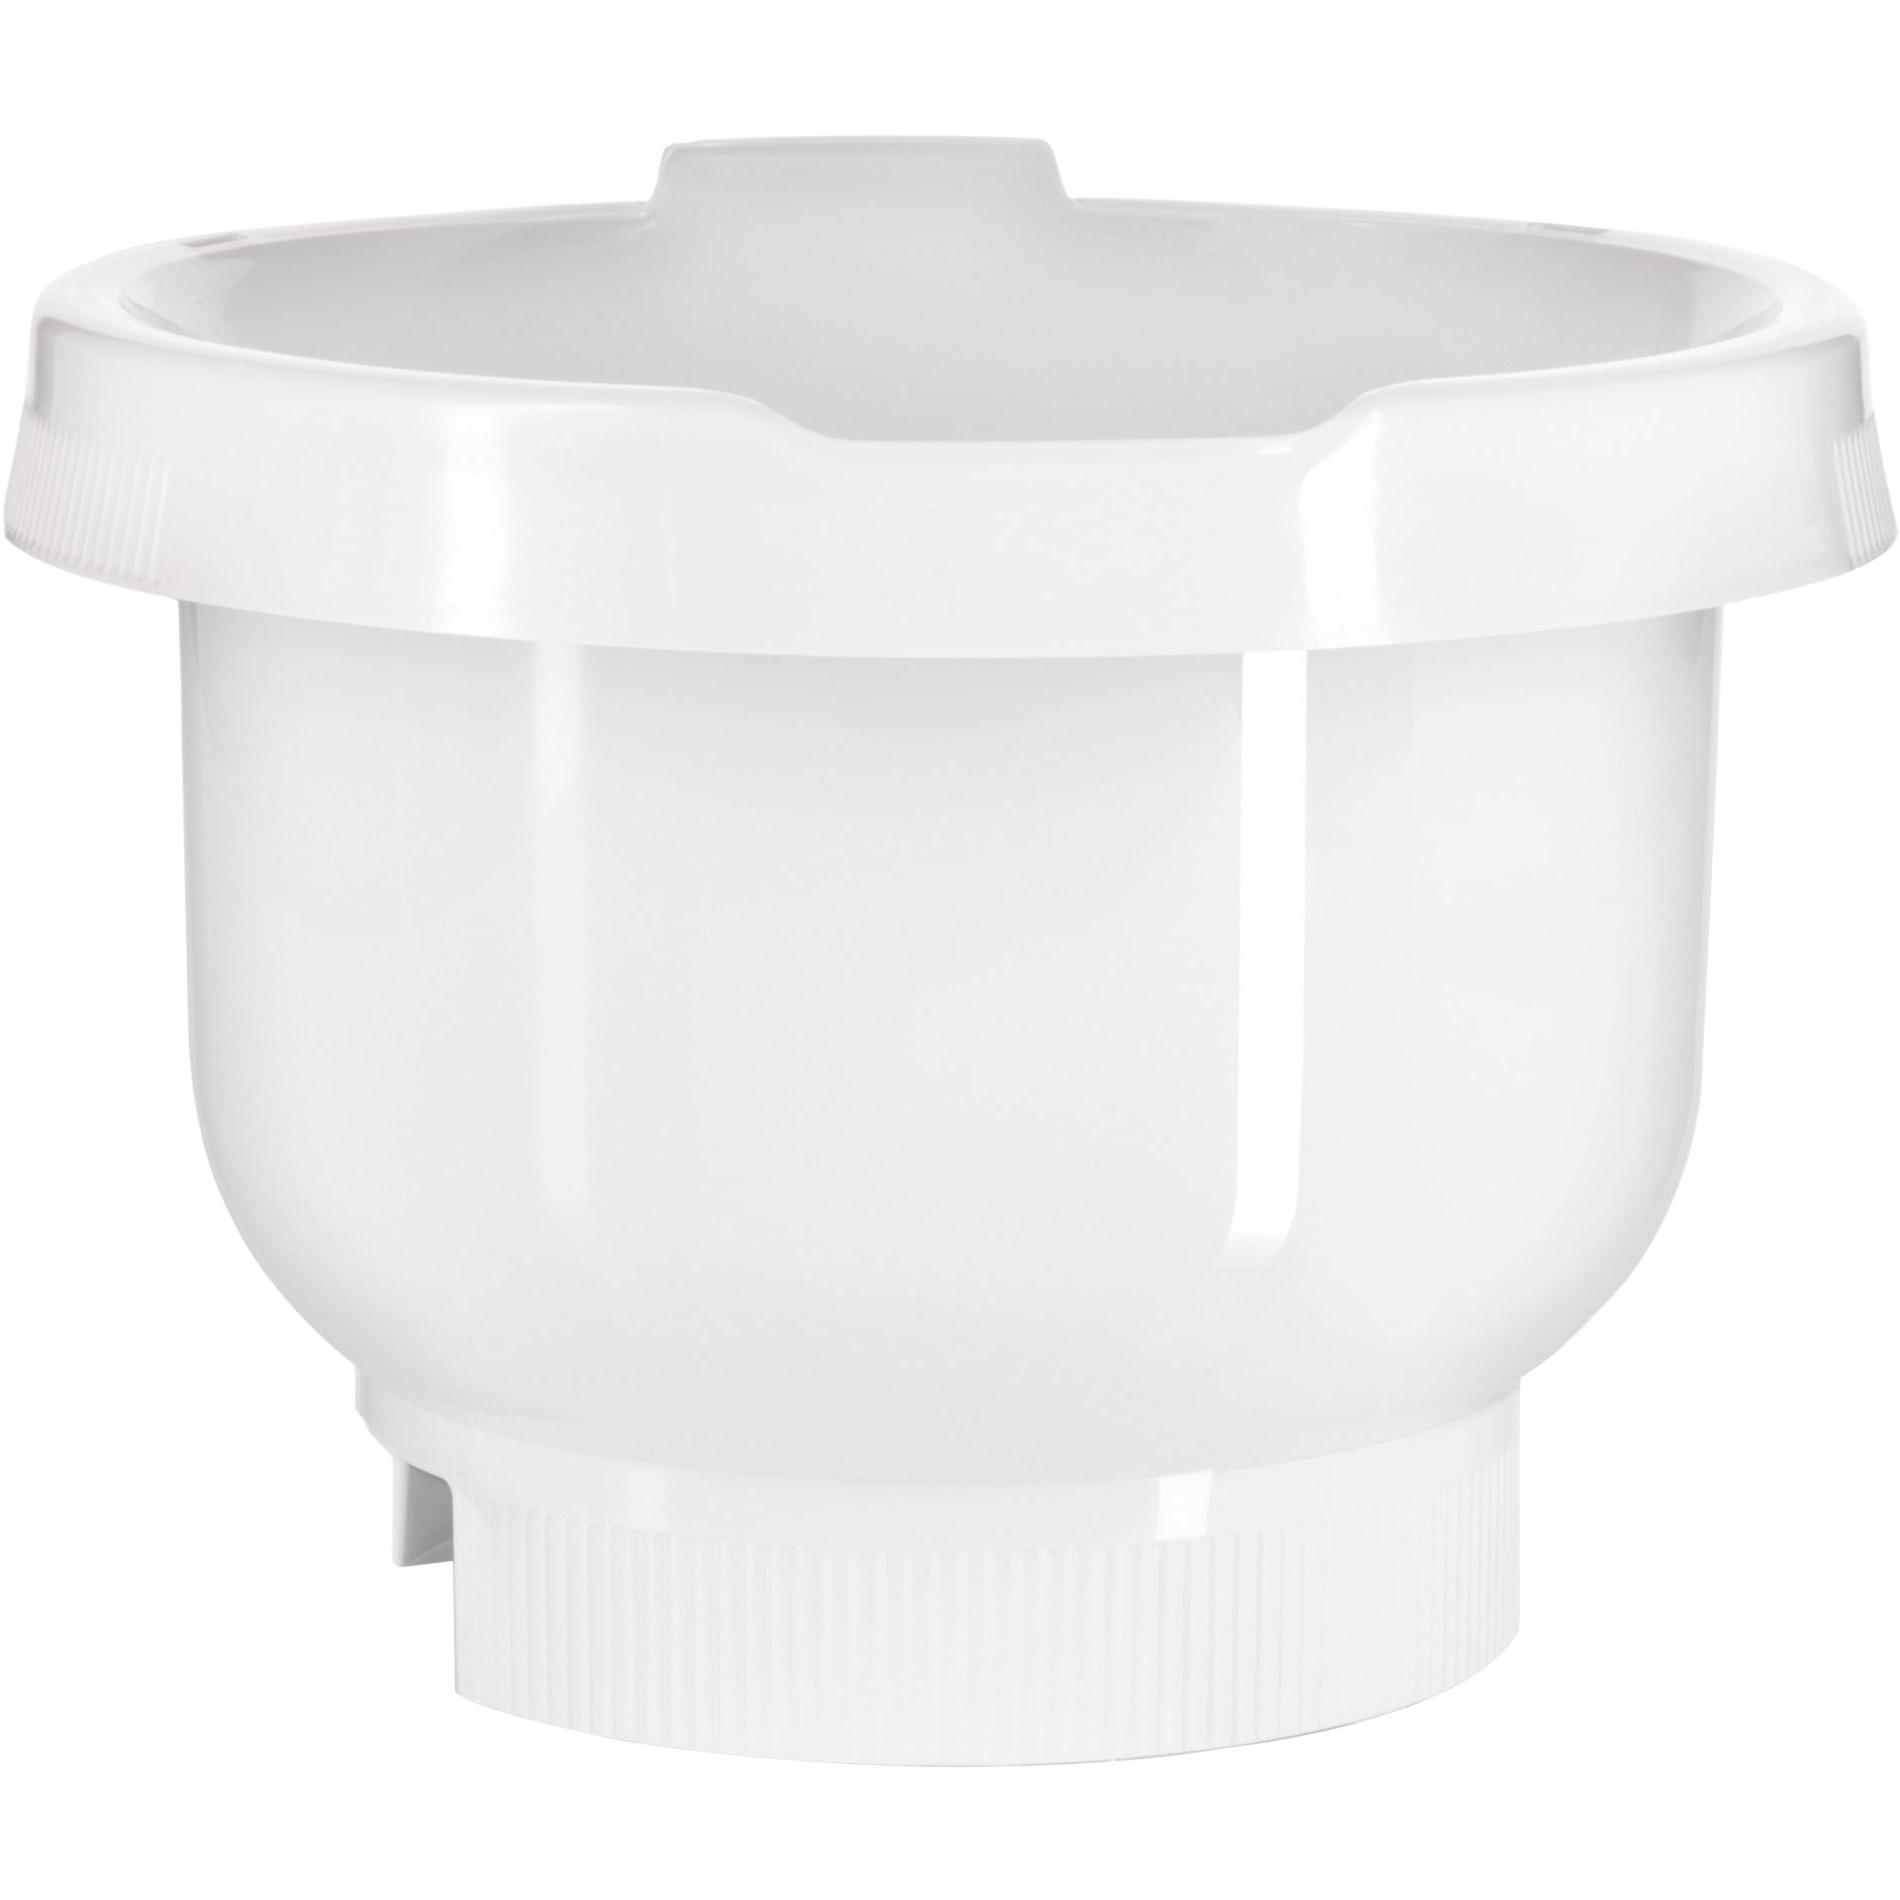 MUZ4KR3 recipiente de almacenar comida Alrededor Blanco, Bol para mezclar